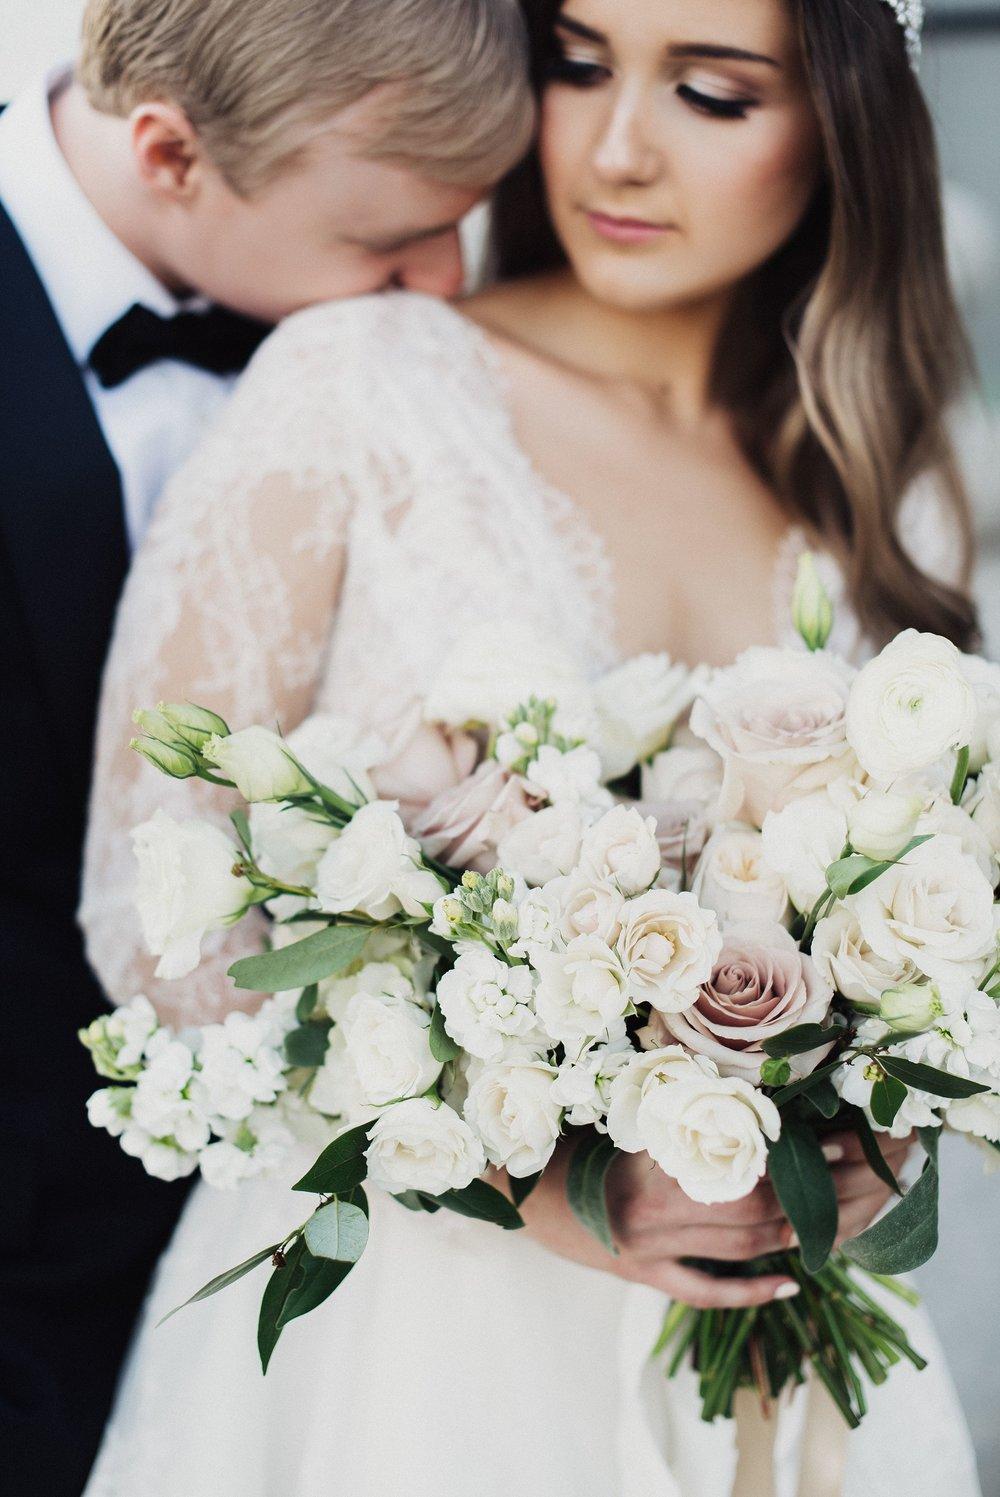 All white wedding details